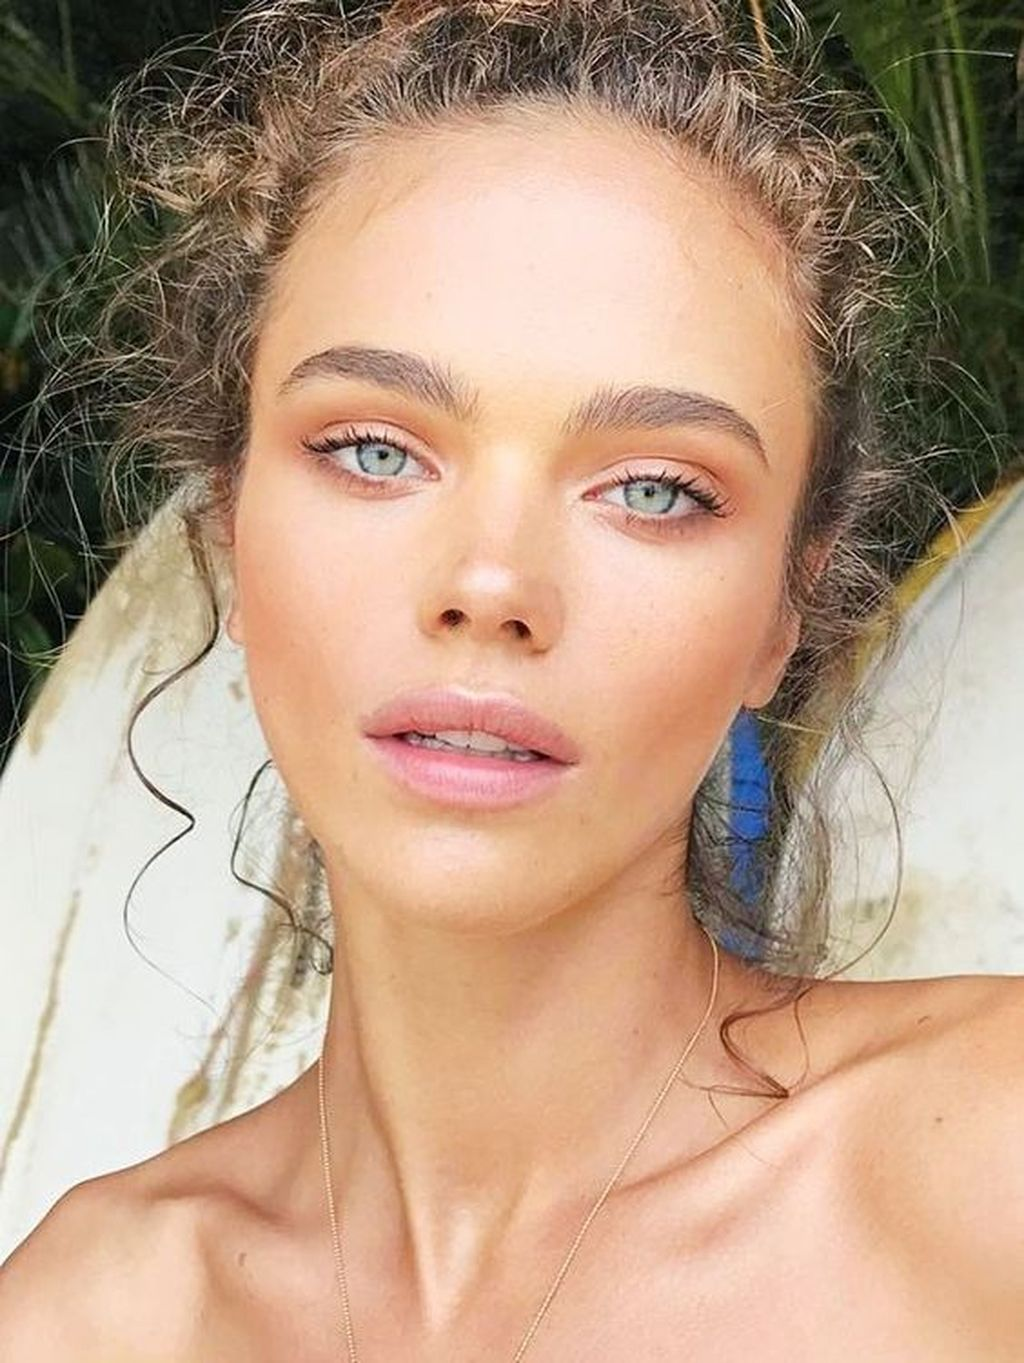 9 Perfect Summer Beach Makeup Ideas - Fashionmoe  Amazing